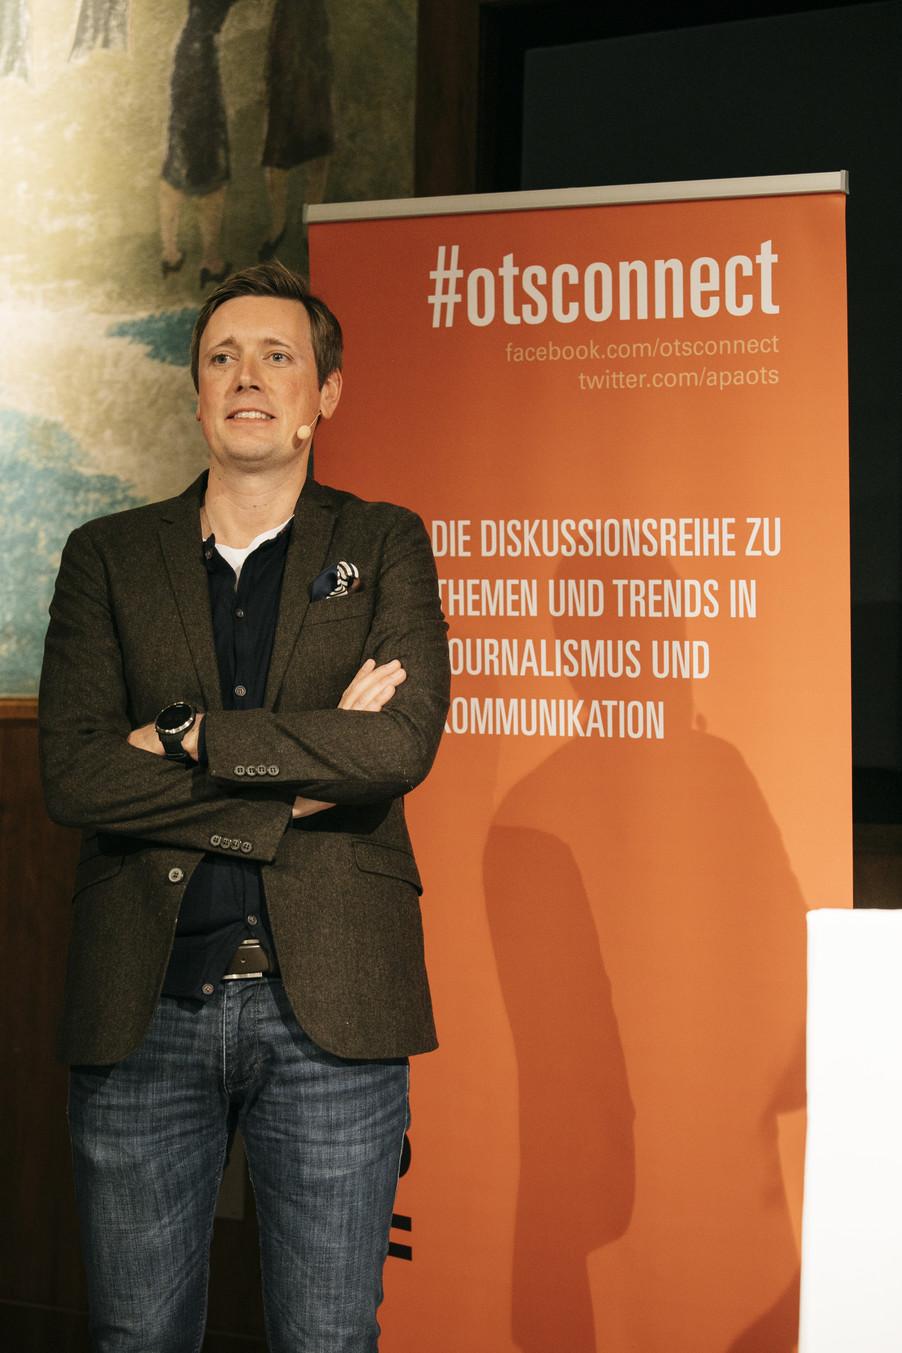 Bild 10 | OTSconnect: Visuelles Storytelling – Wenn Bilder sprechen